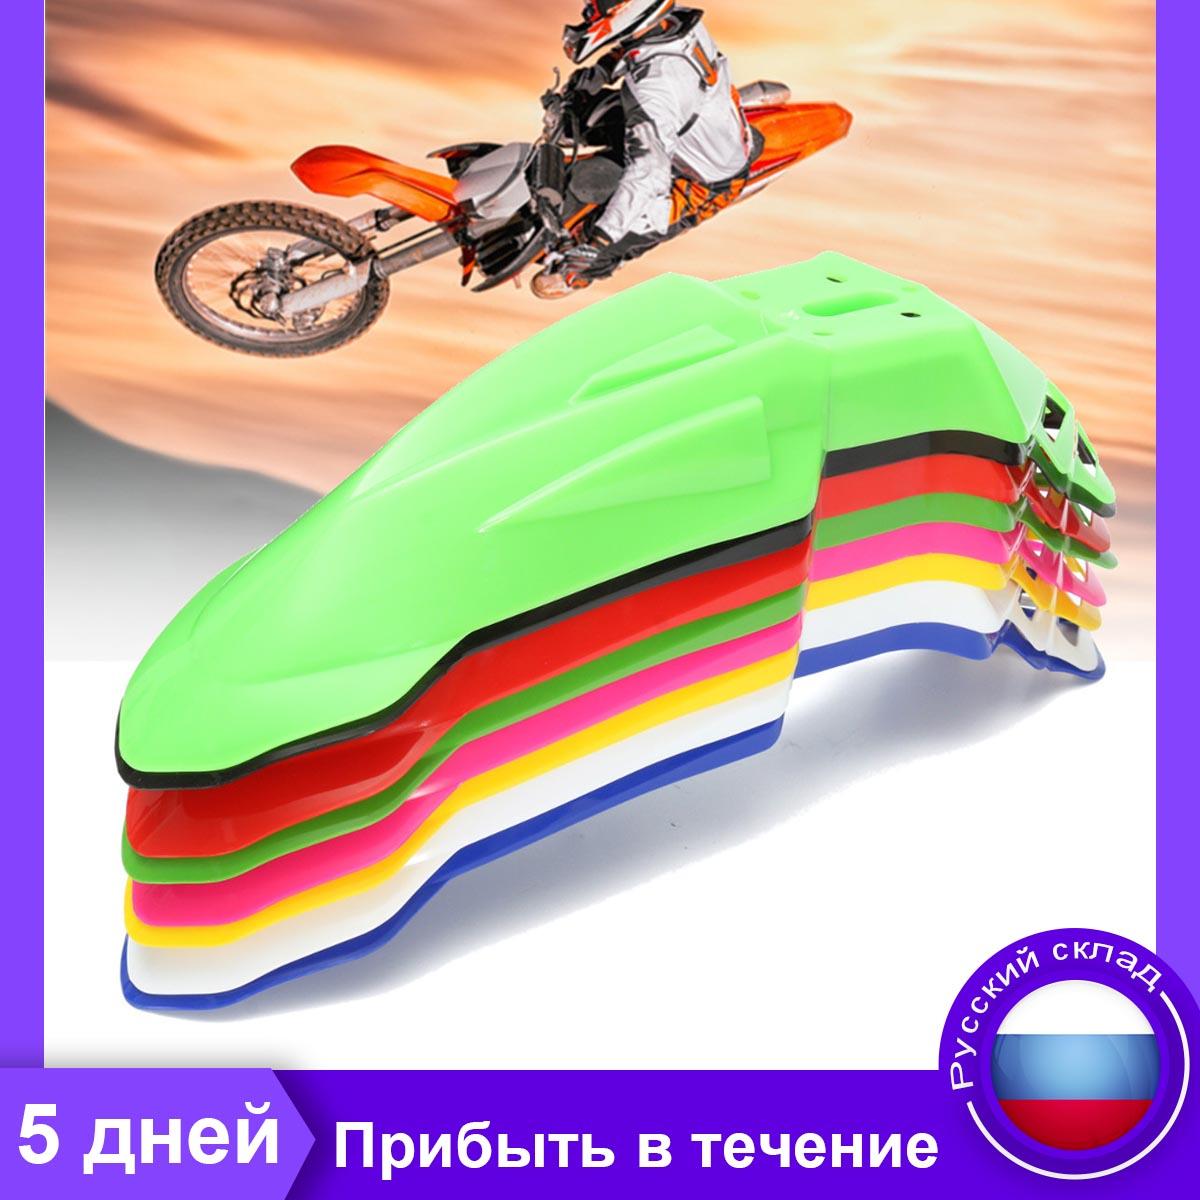 ABS Plastic Universal Motorcycle Front Mud Flap Mudguard Fender Accessories For KTM/Honda/Yamaha/Kawasaki/Suzuki